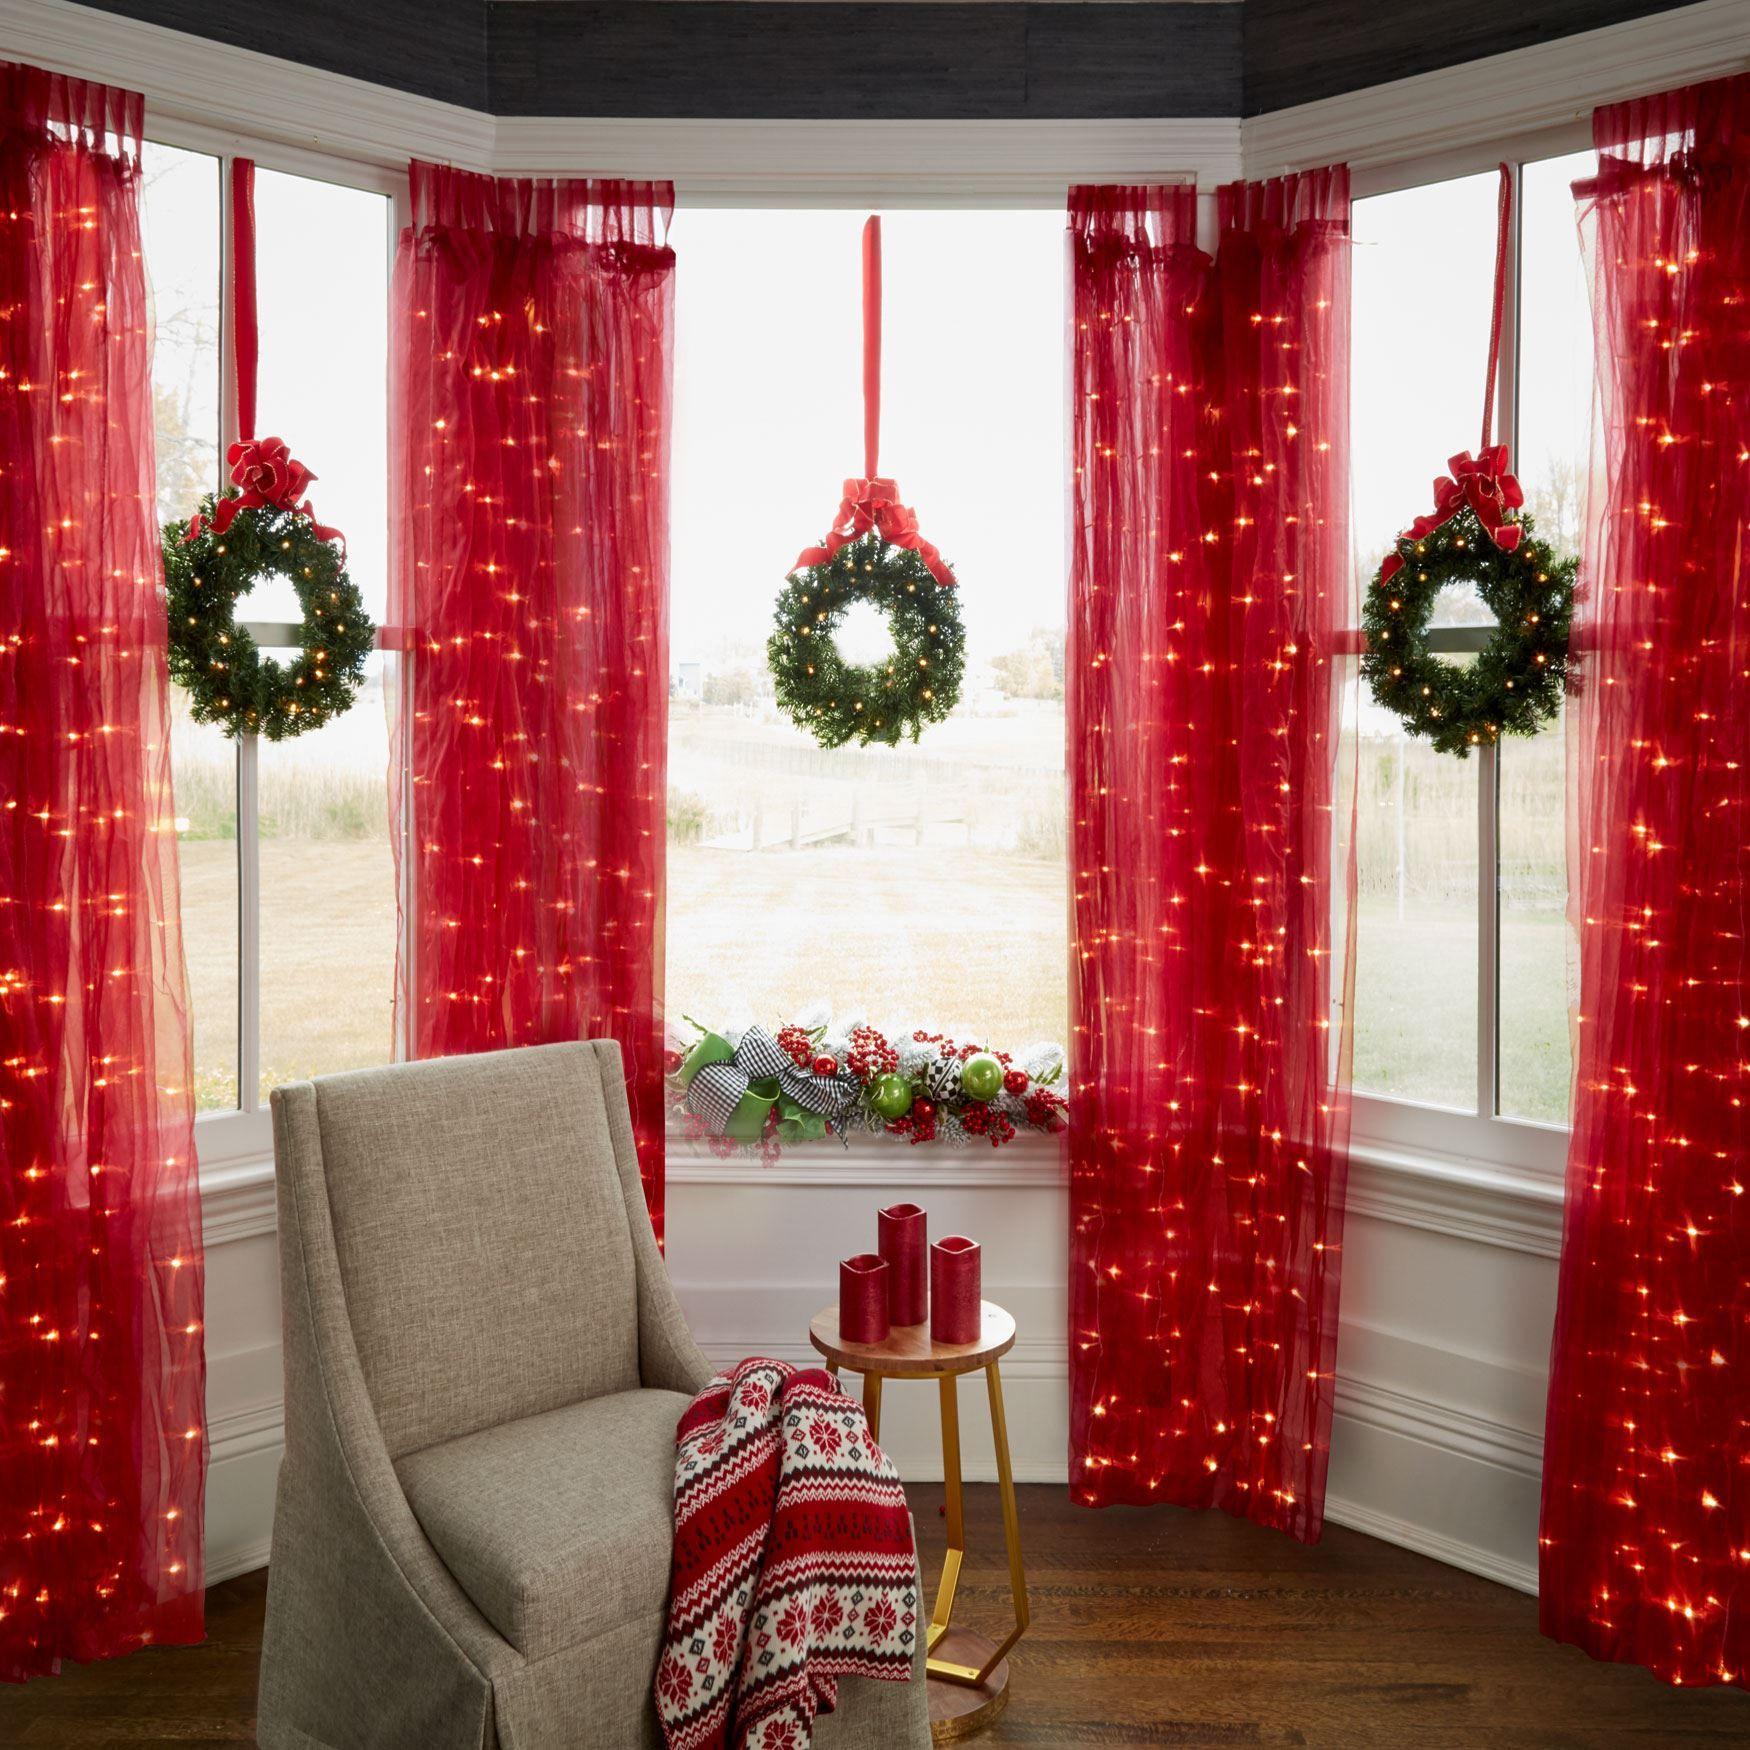 A festive trio of mini Christmas wreaths, each gleaming